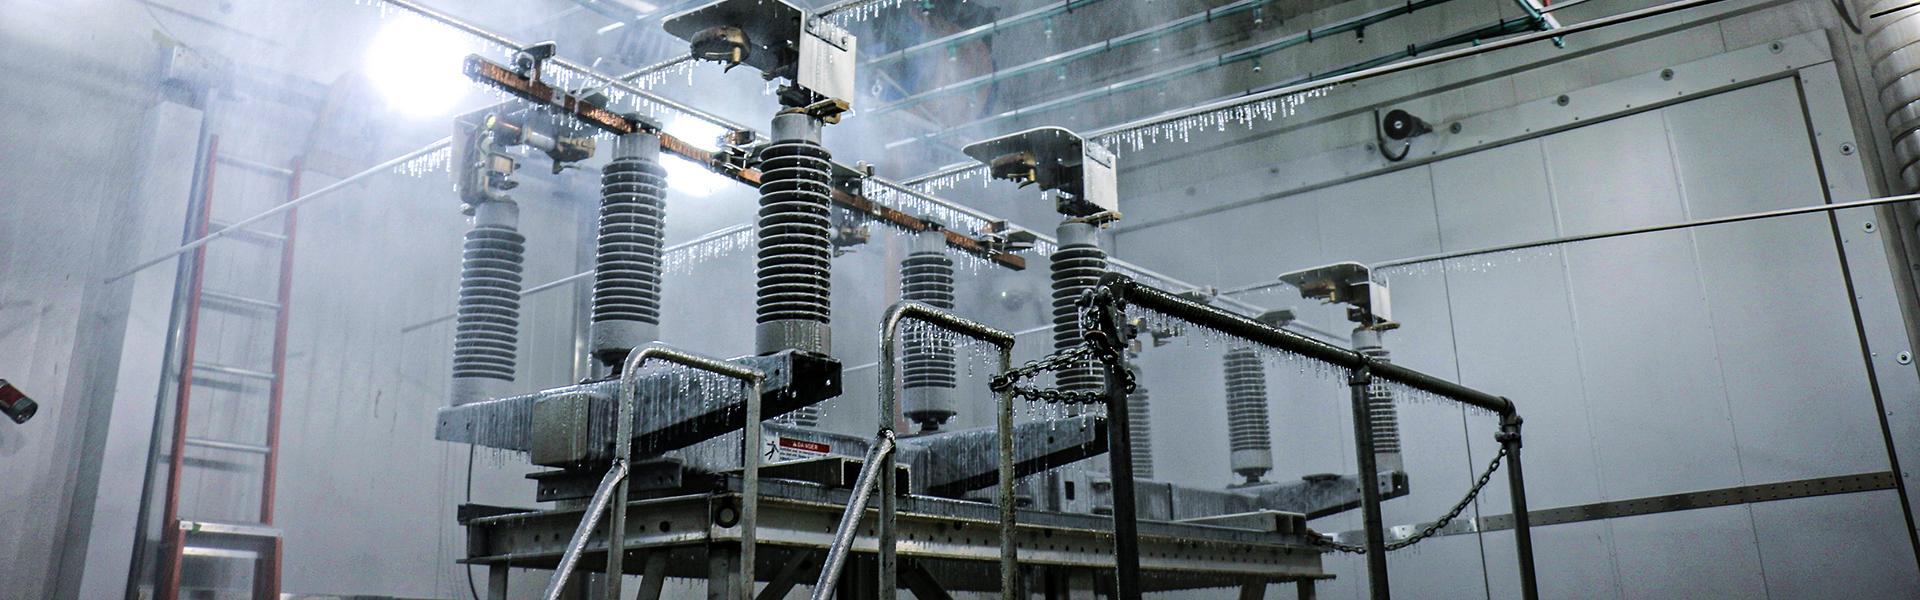 Freezing rain on a transformer